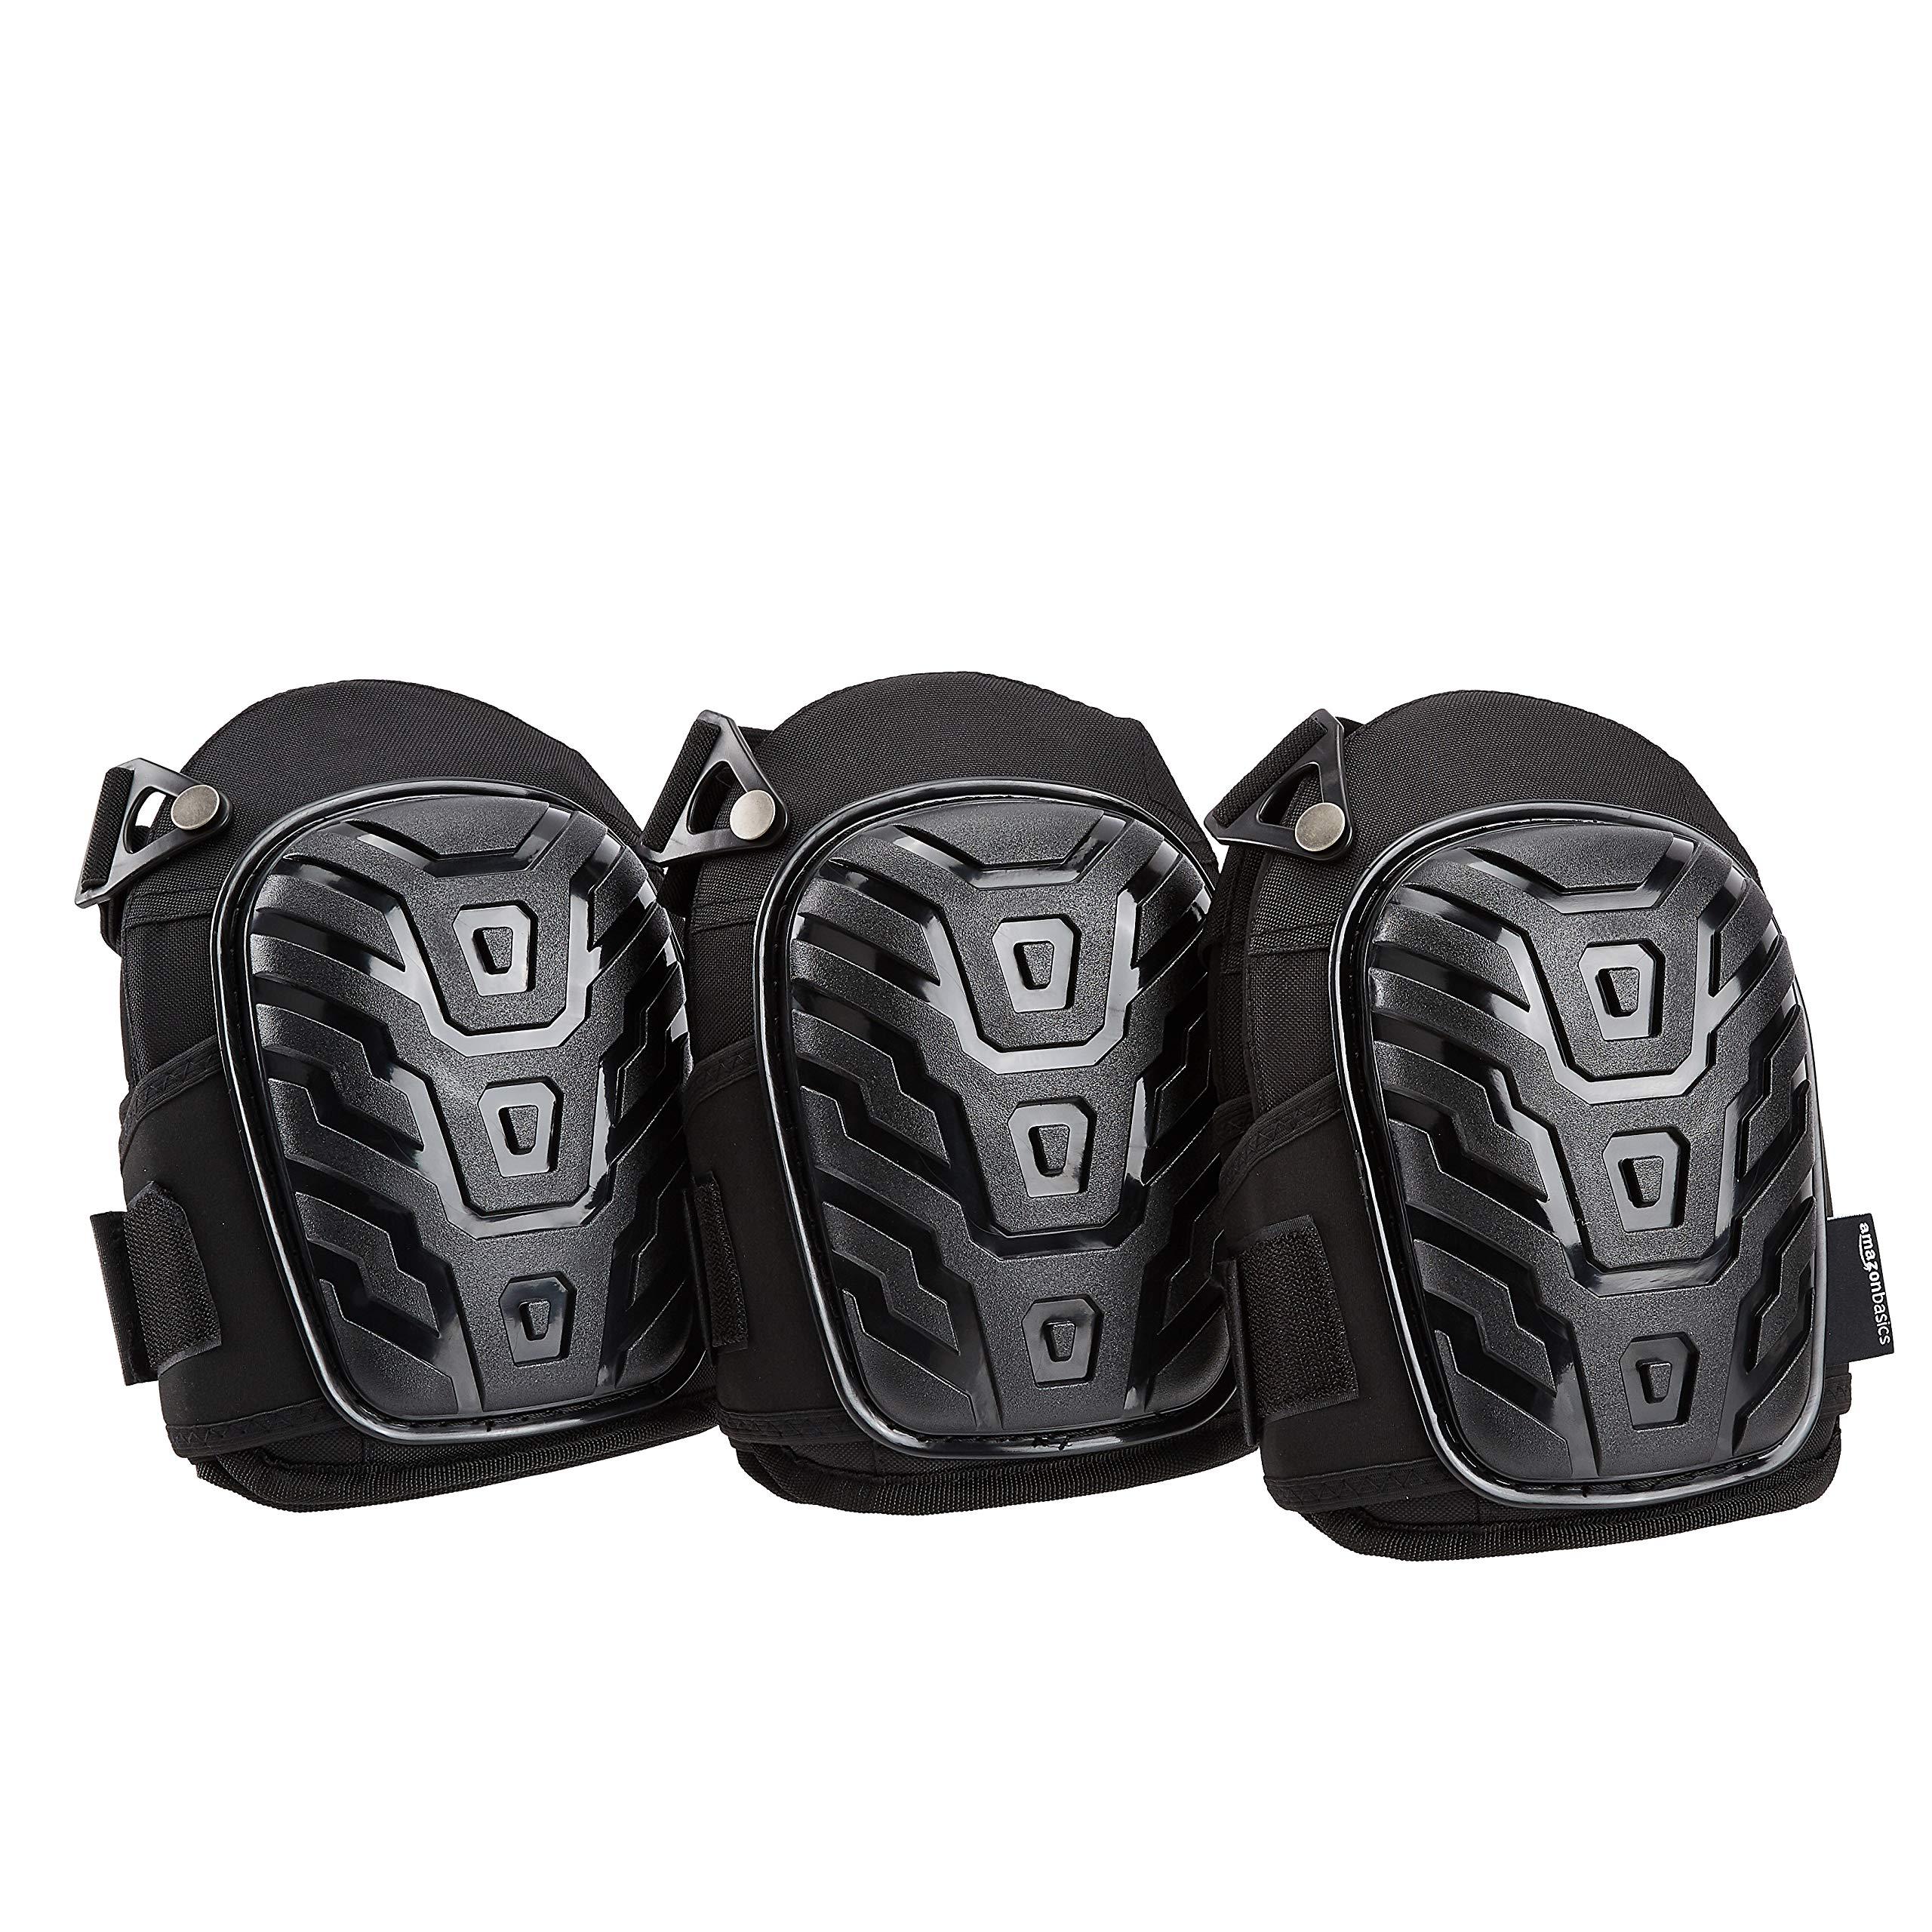 AmazonBasics Professional Gel Cushion Knee Pads,Black, 3-Pair